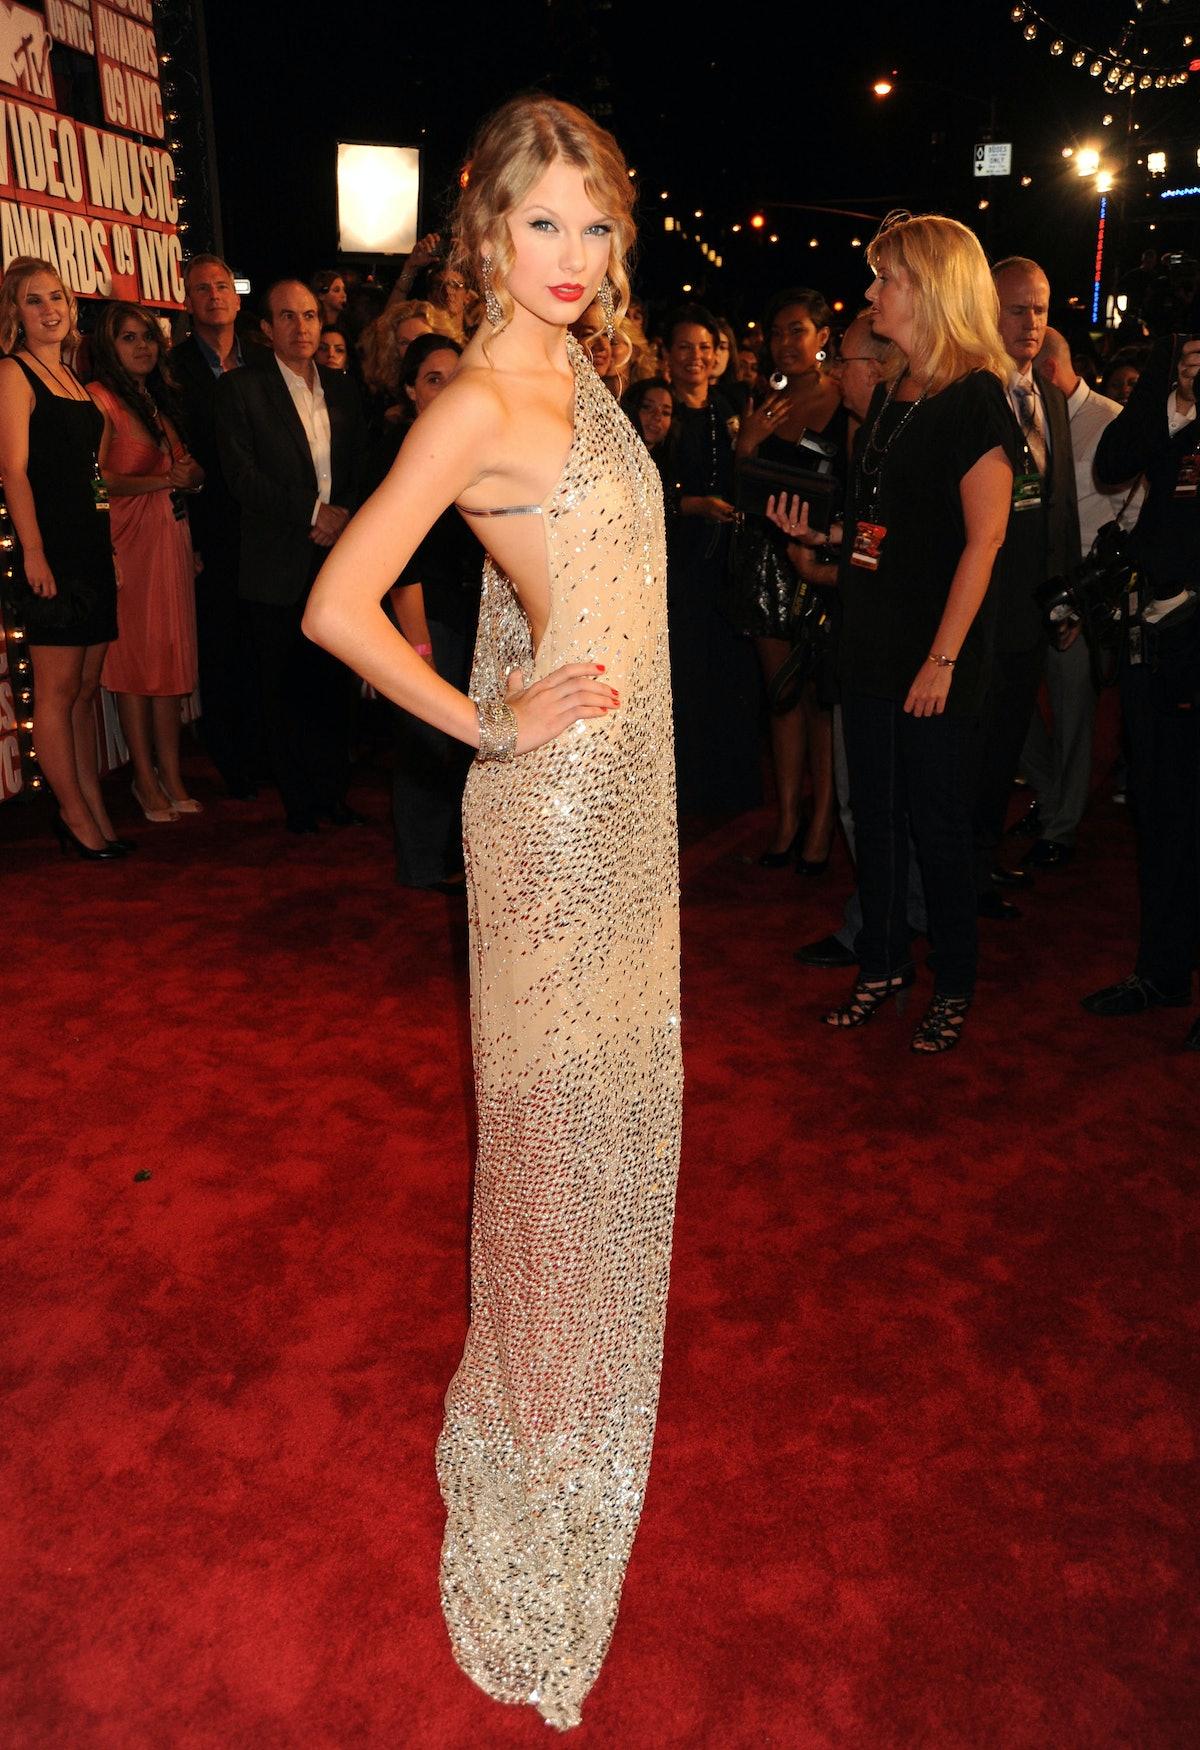 2009 MTV Video Music Awards - Red Carpet